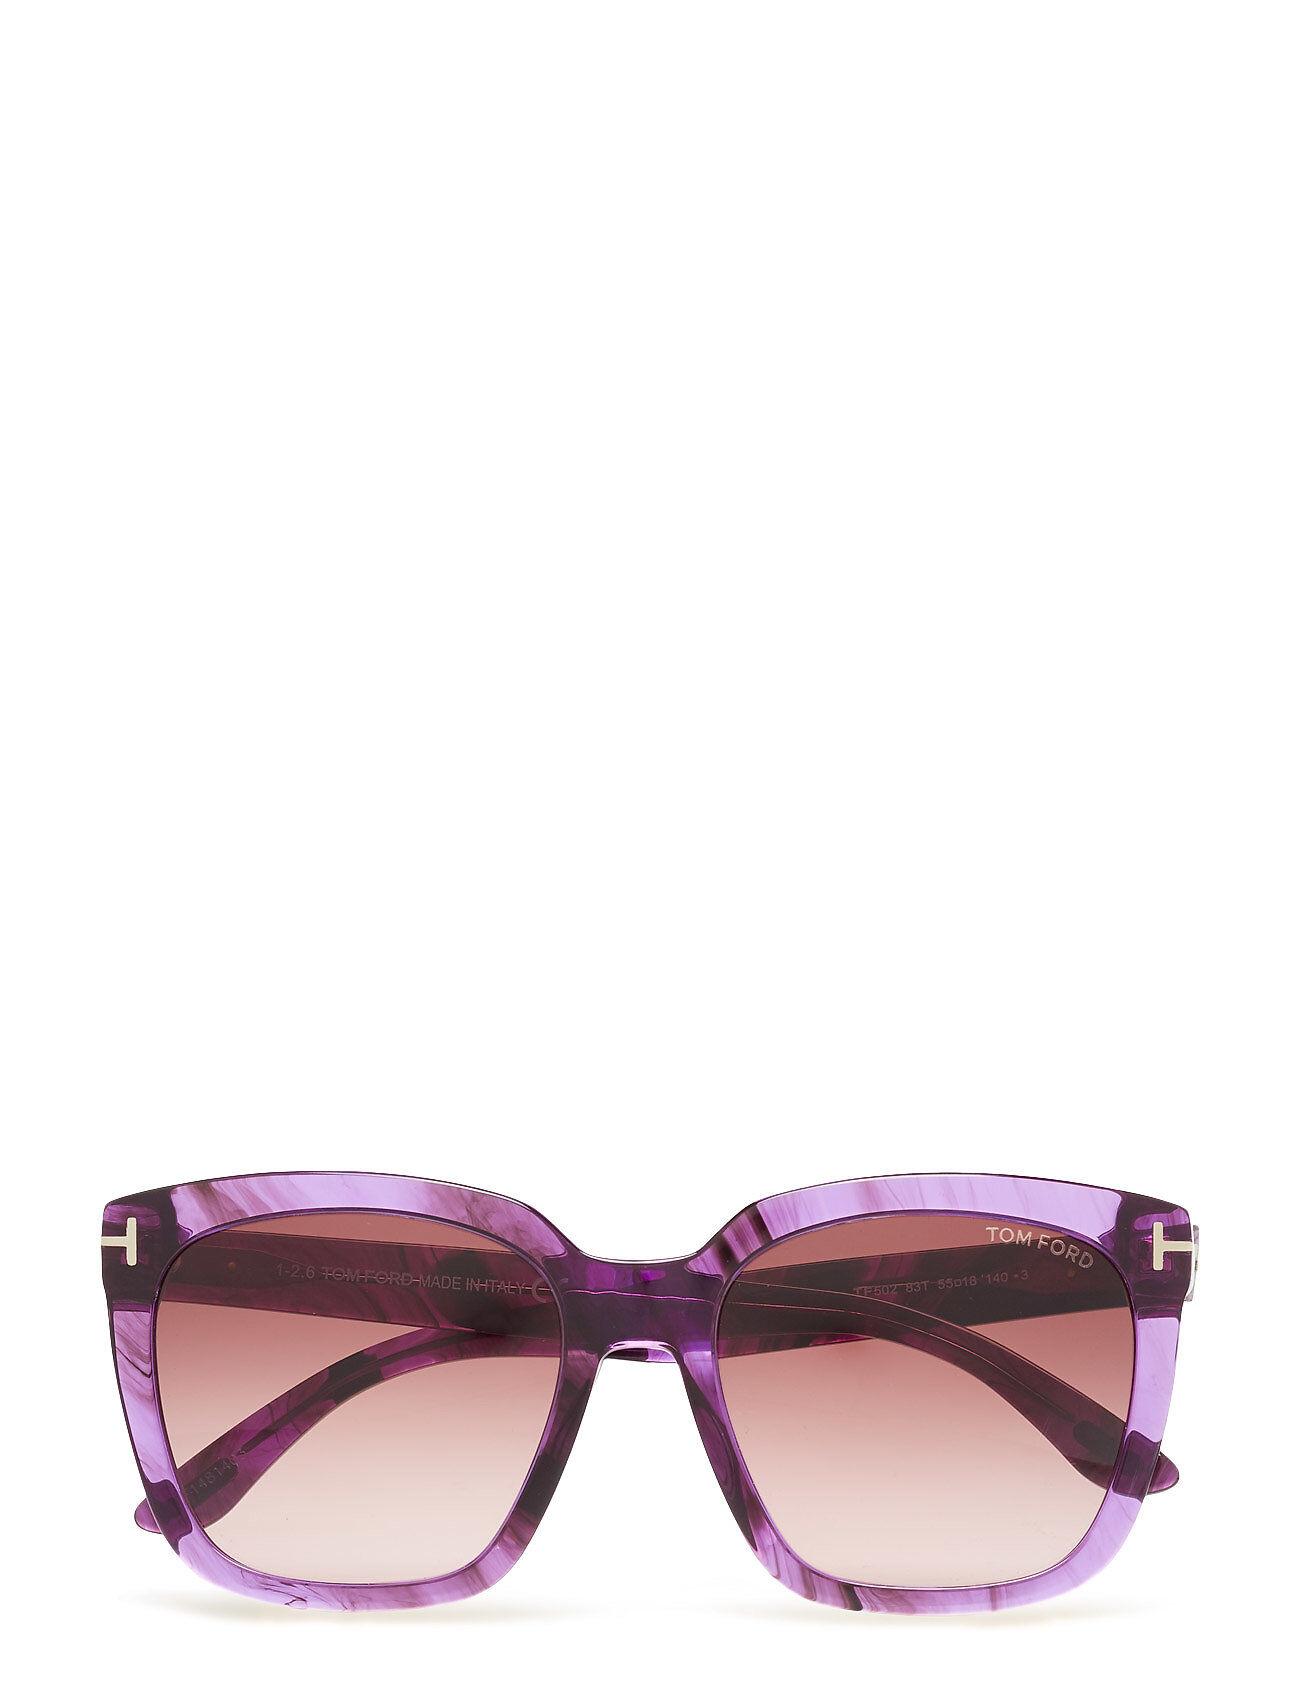 Image of Tom Ford Sunglasses Tom Ford Amarra Wayfarer Aurinkolasit Liila Tom Ford Sunglasses